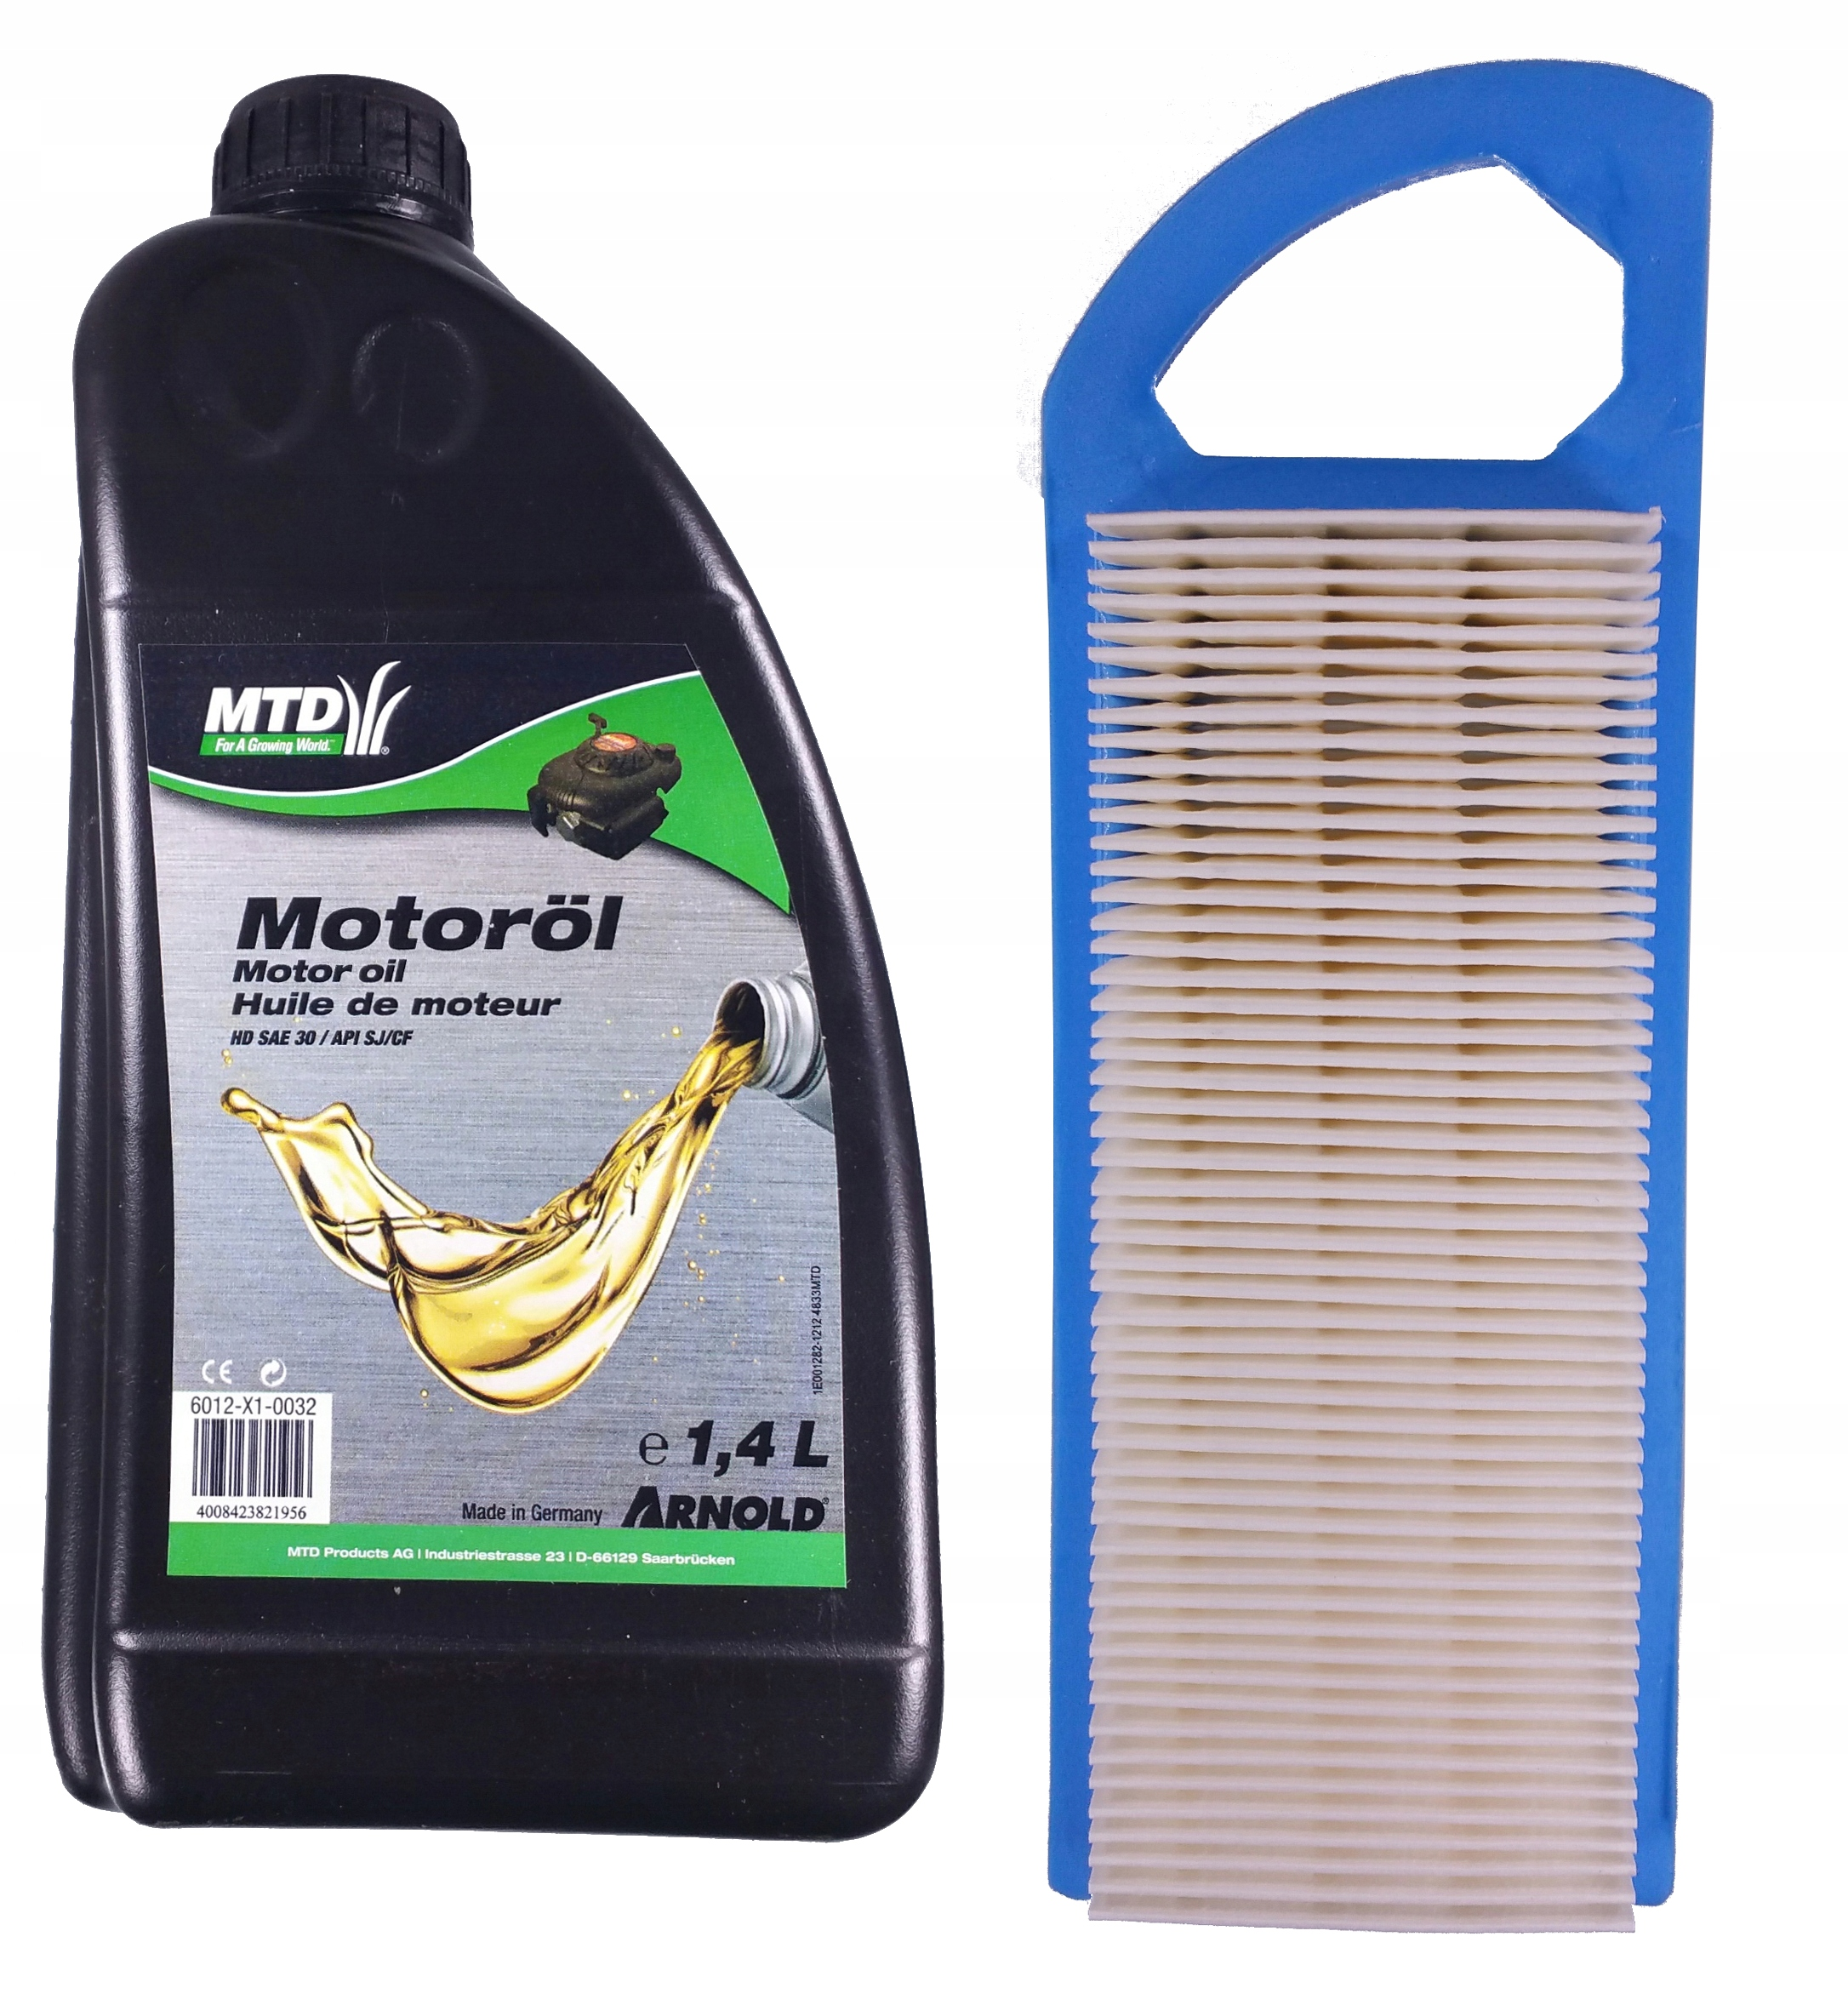 222x79 filter + olej 1.4 L motor BRIGGS STRATTO